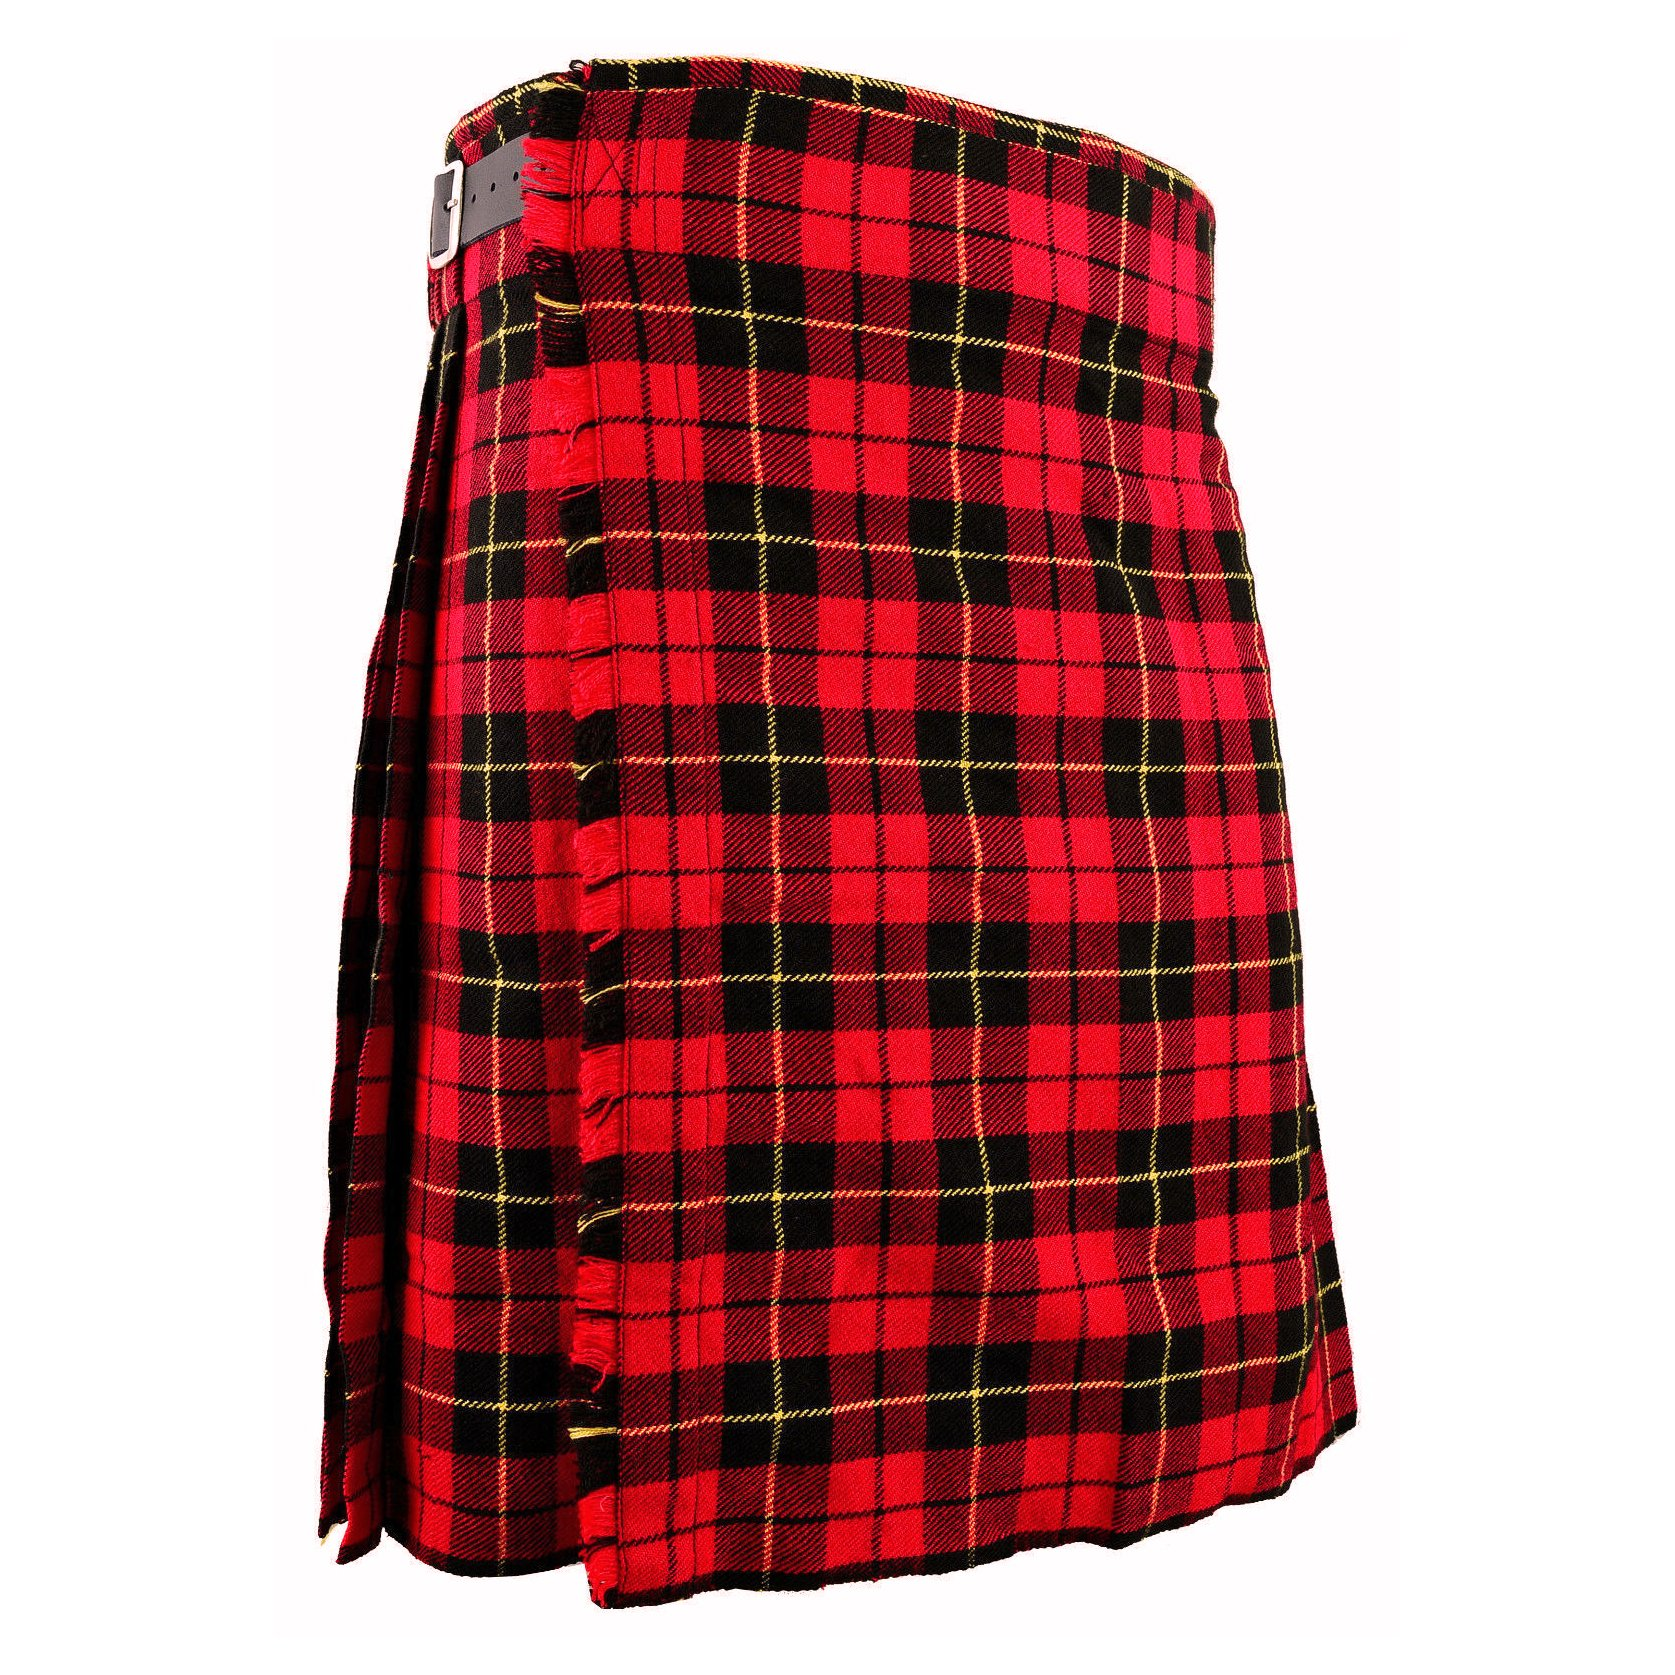 Men's 6 Yard's Wallace Scottish Traditional Kilt Tartan Highland Kilt (1)